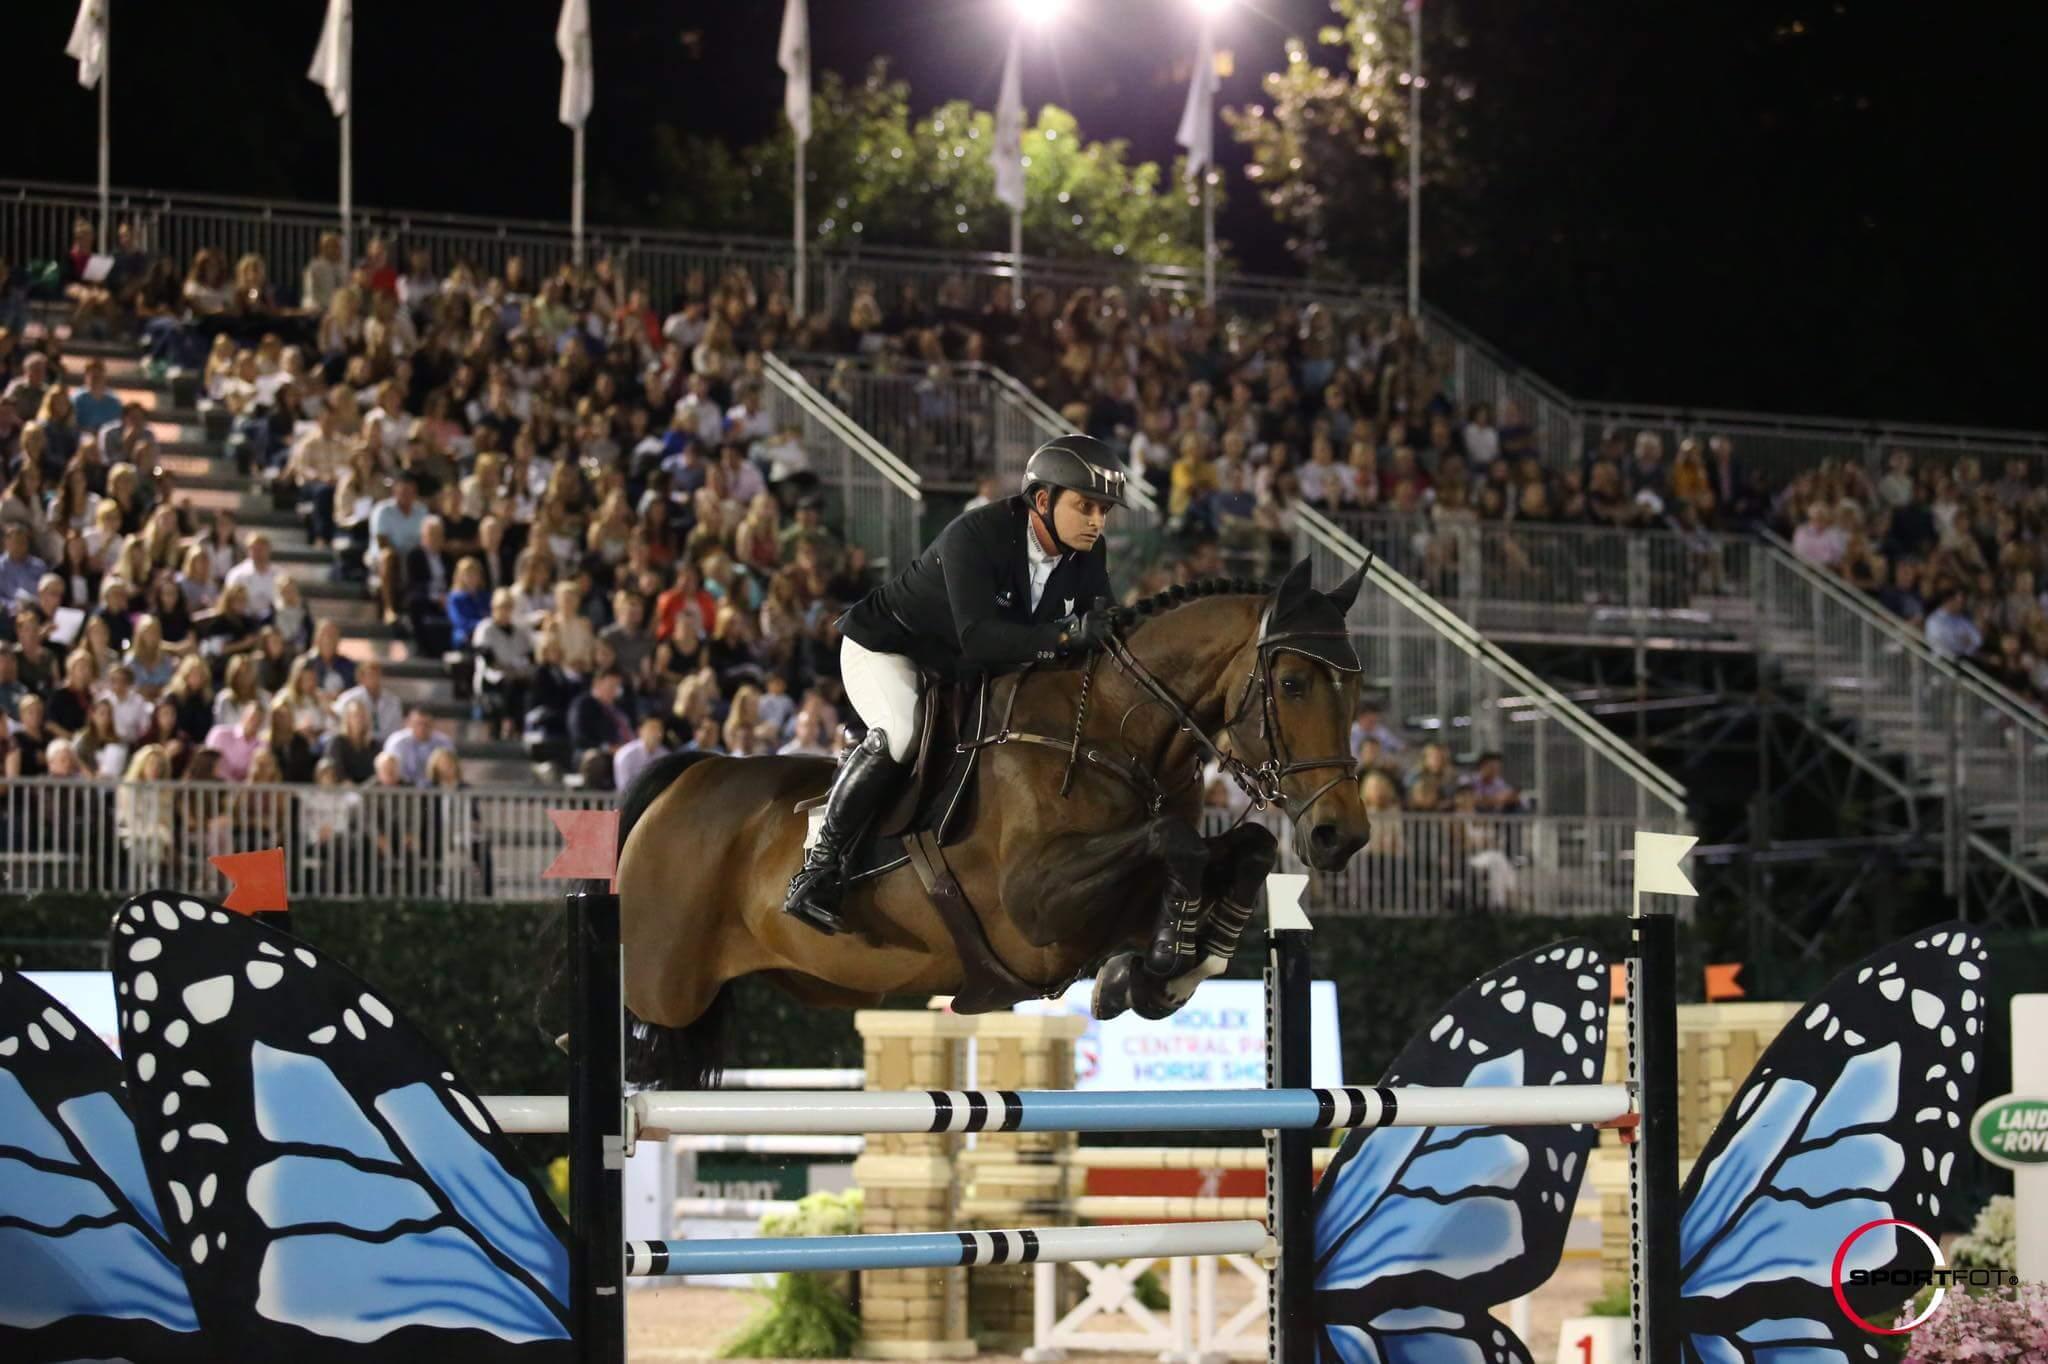 GIGOLO VAN DE BROEKKANT @ Central Park Horse Show